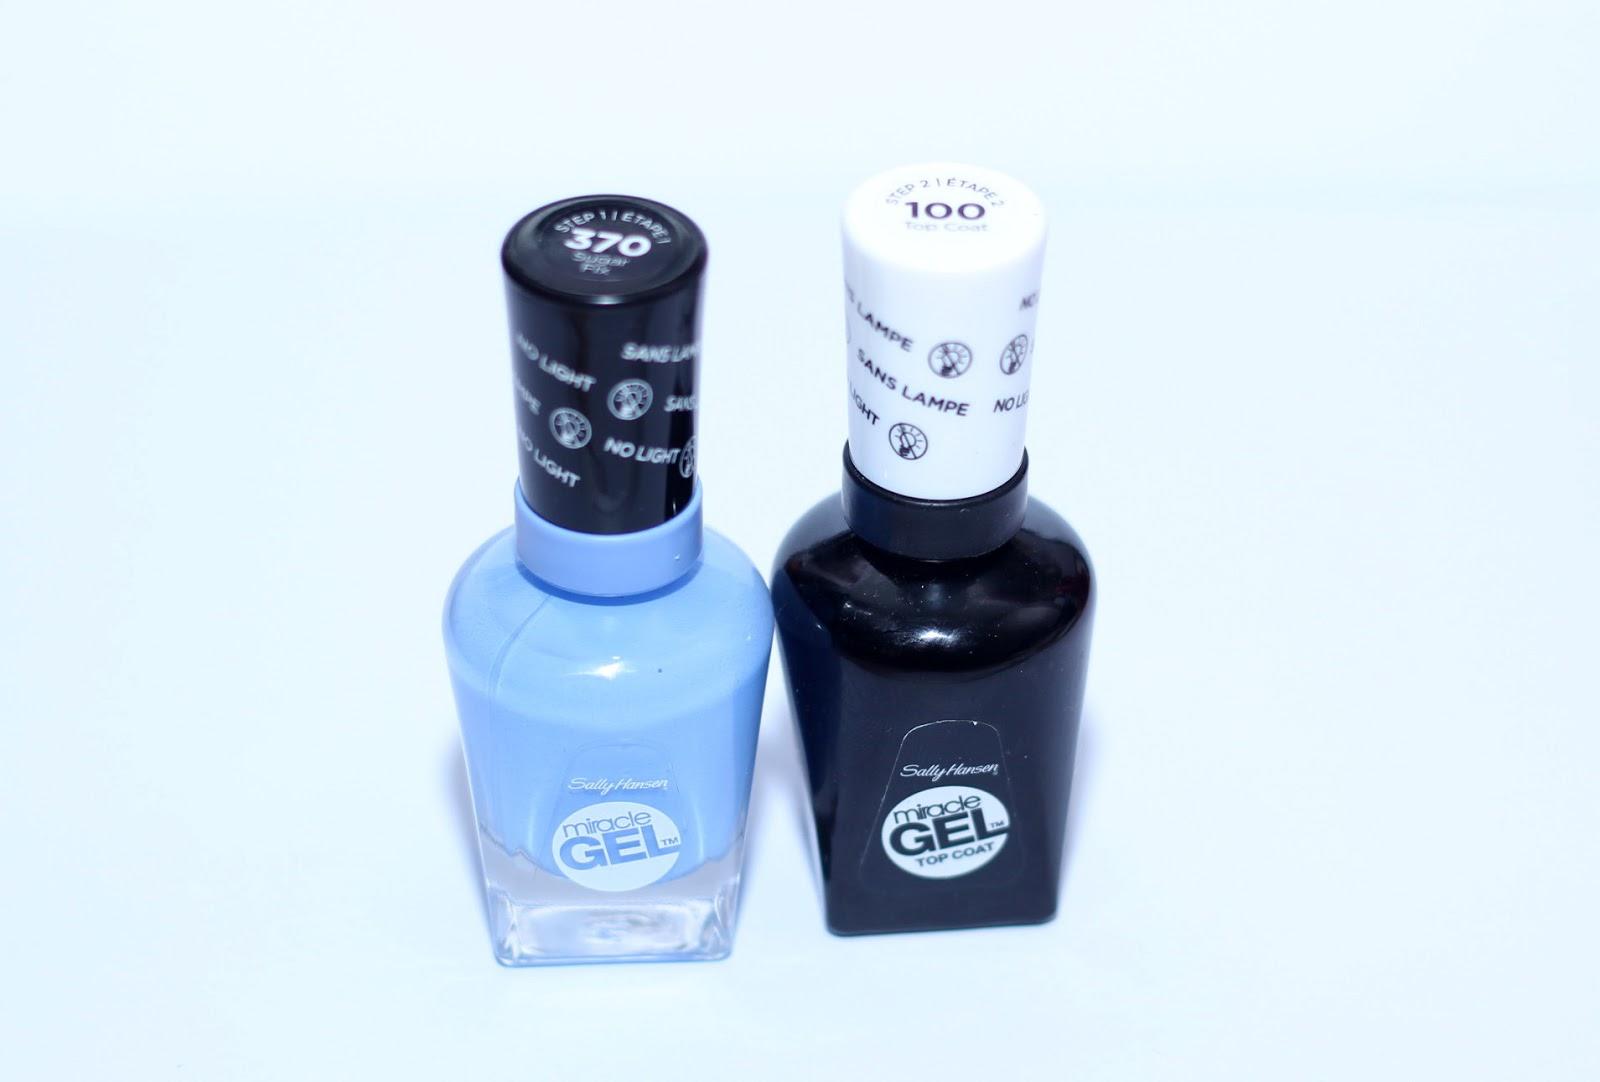 Top Coat Nail Polish Target - Creative Touch